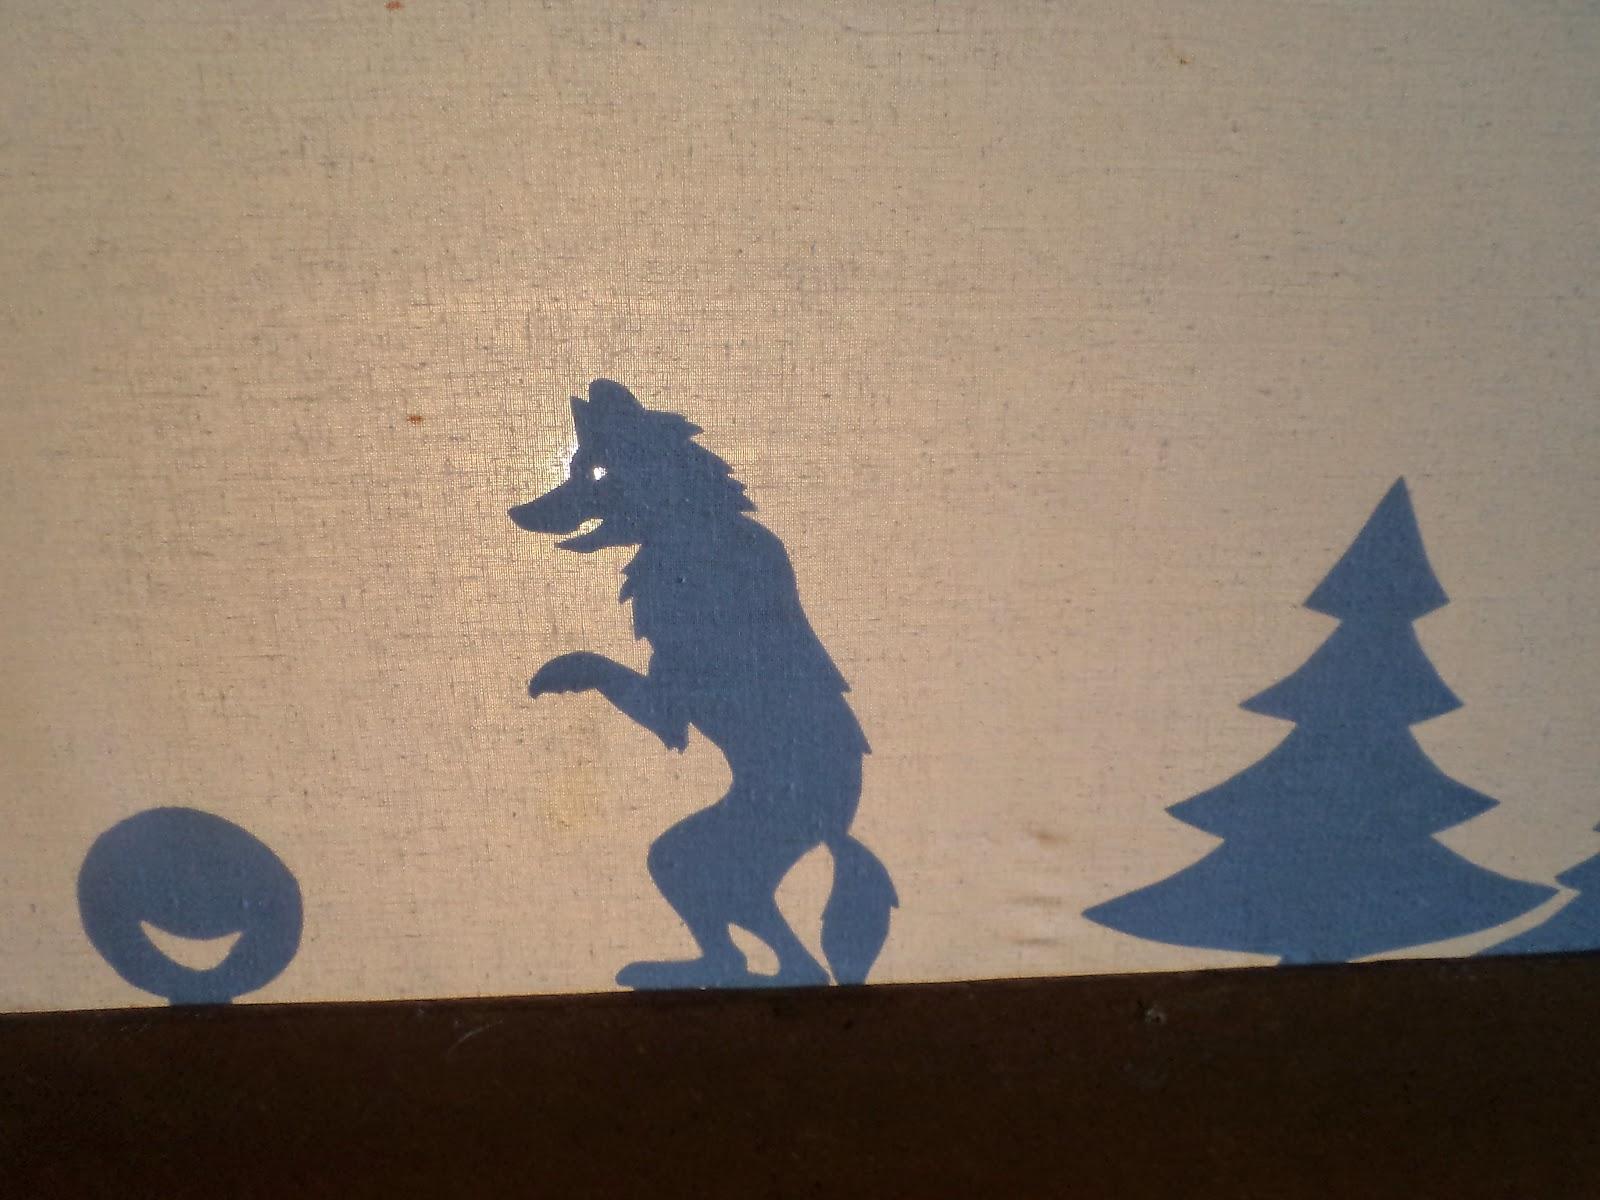 Шаблоны для теневого театра своими руками - KarLiam